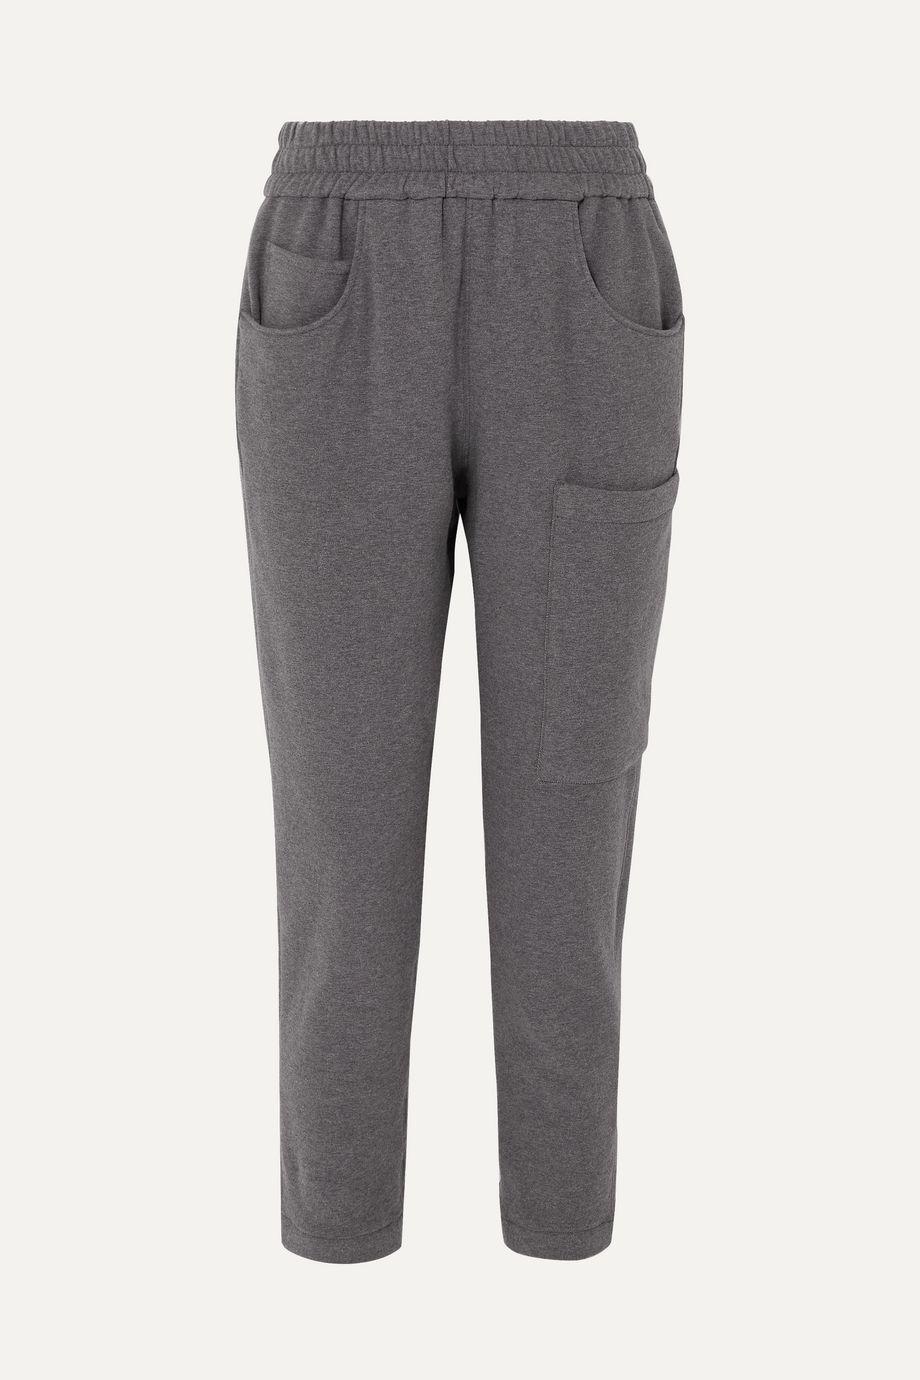 Brunello Cucinelli Bead-embellished mélange stretch-cotton jersey track pants